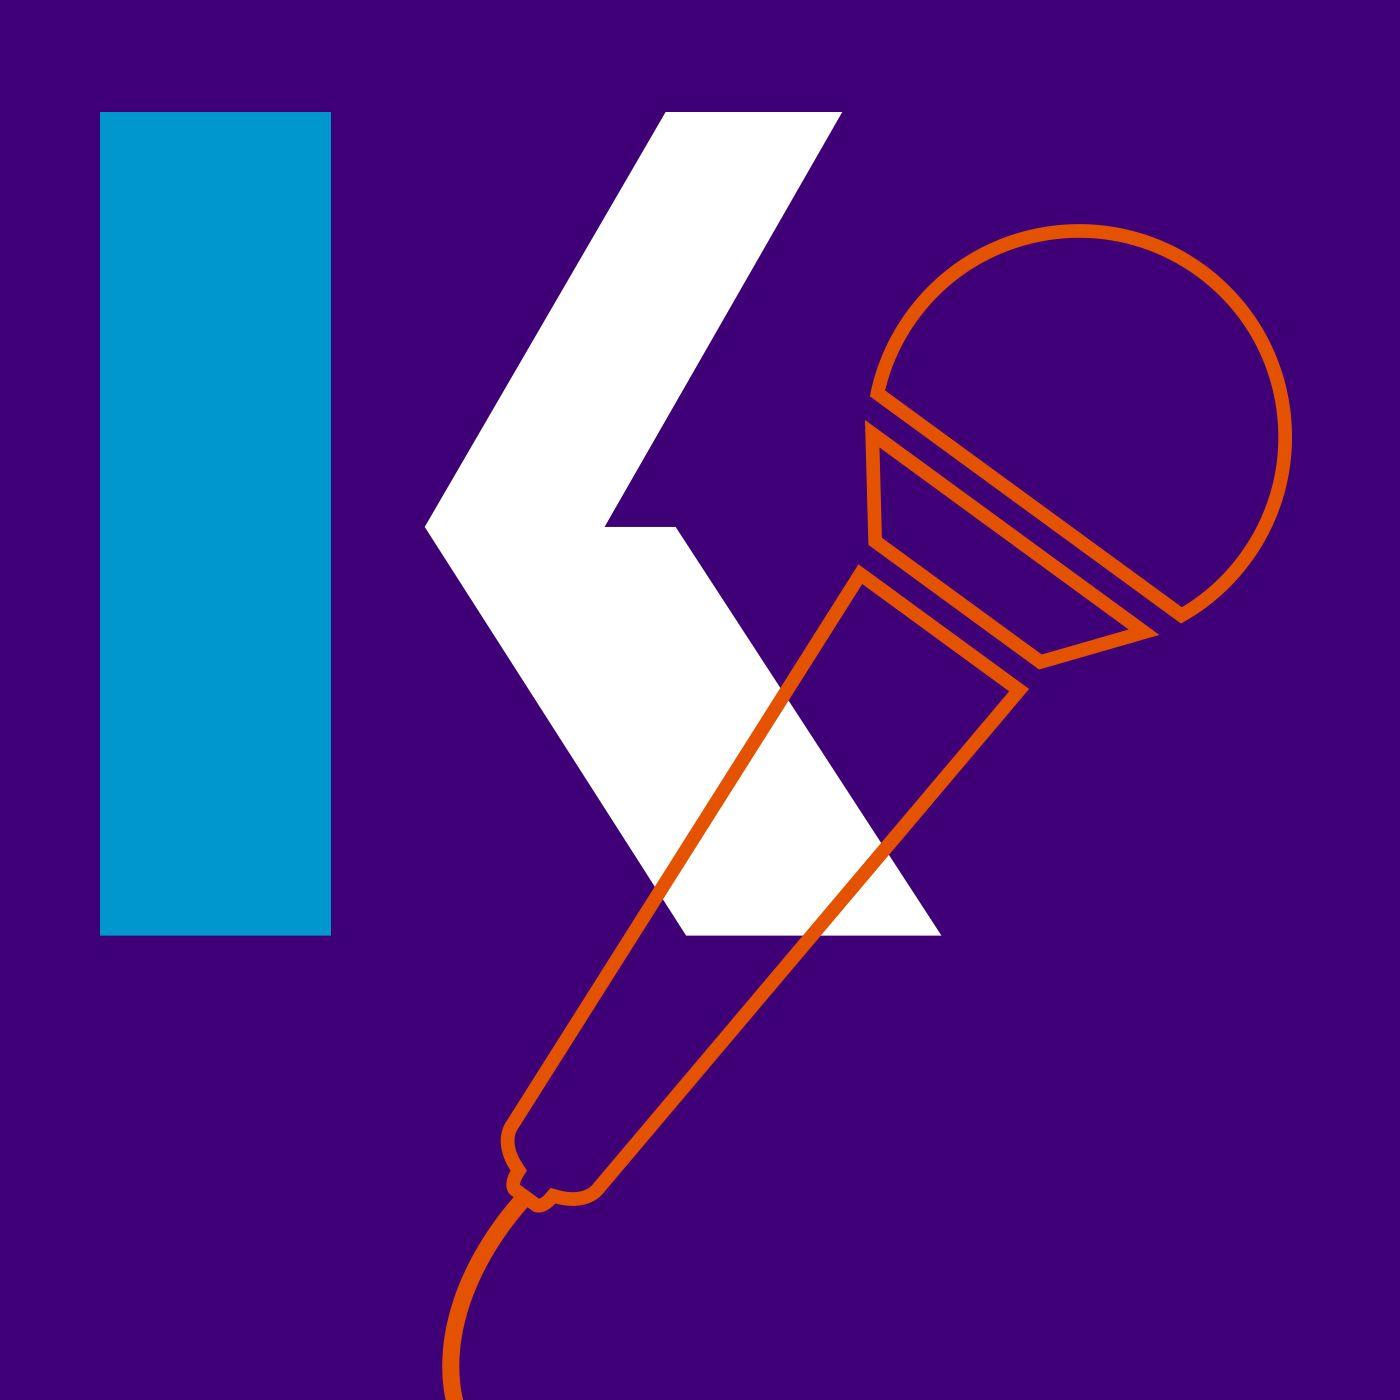 Kaplan's NCLEX Prepcast - Episode 27 - Integrative Medicine